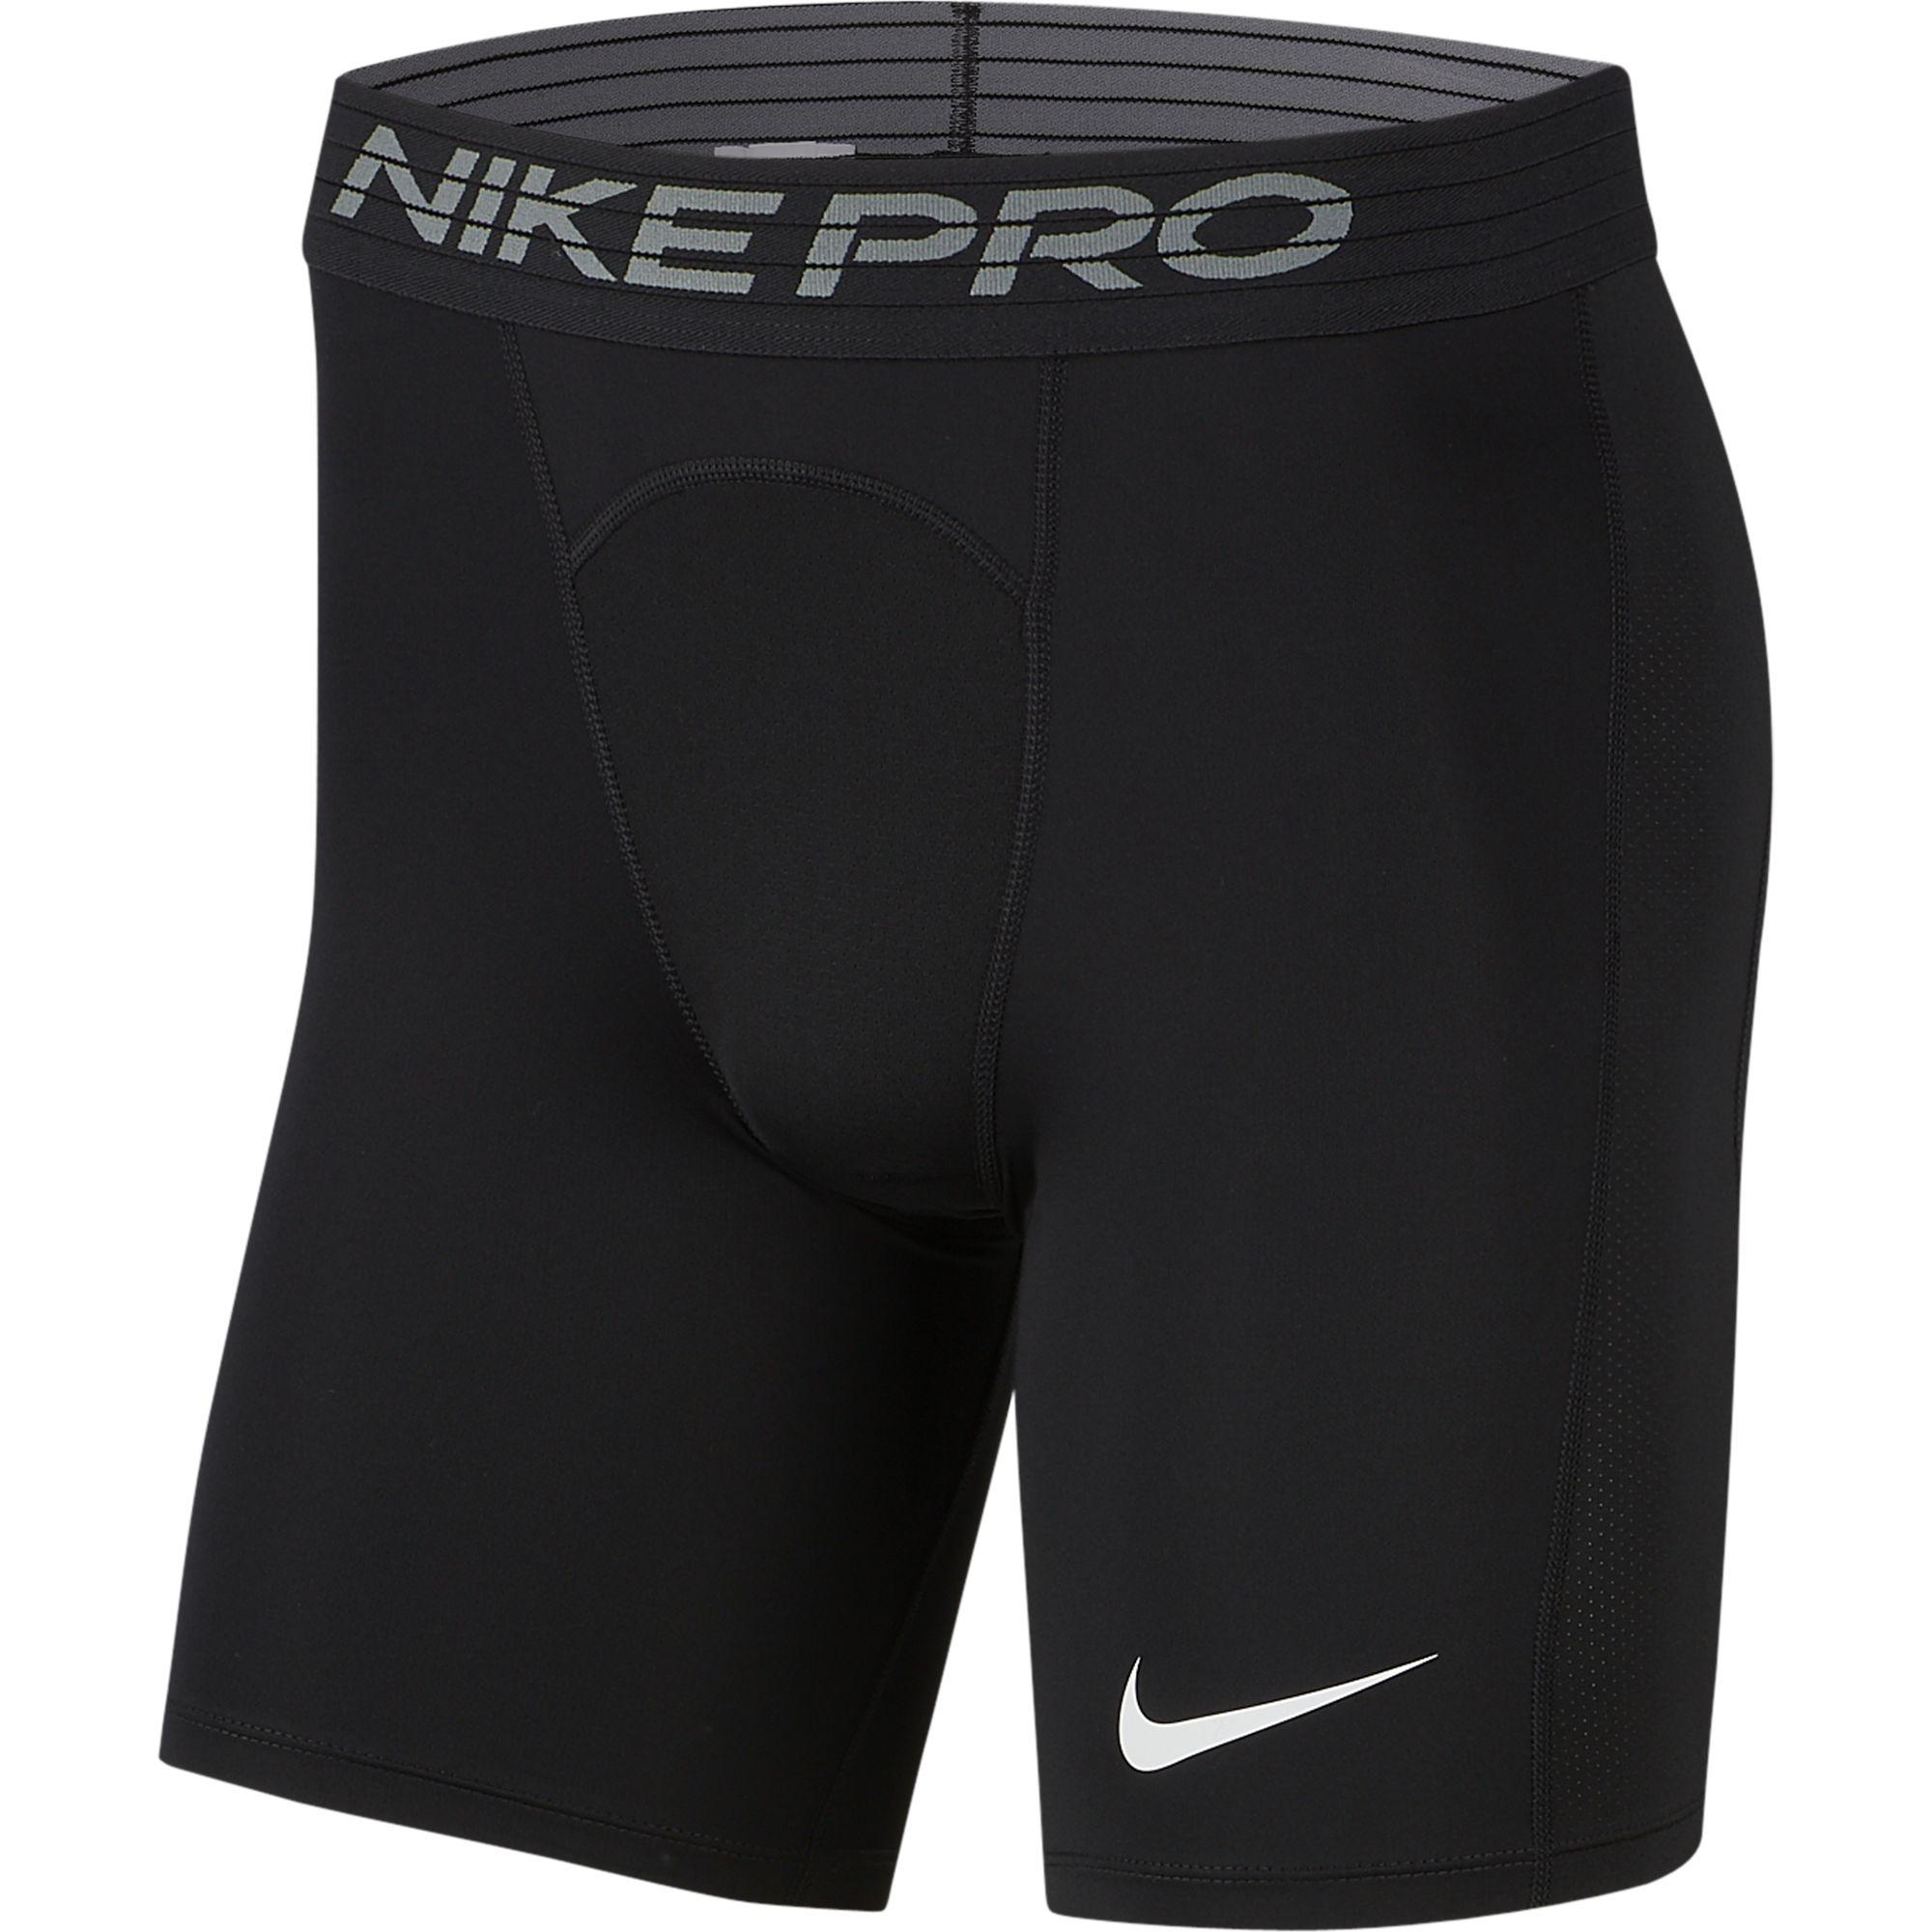 Men's Pro Shorts, Black, swatch